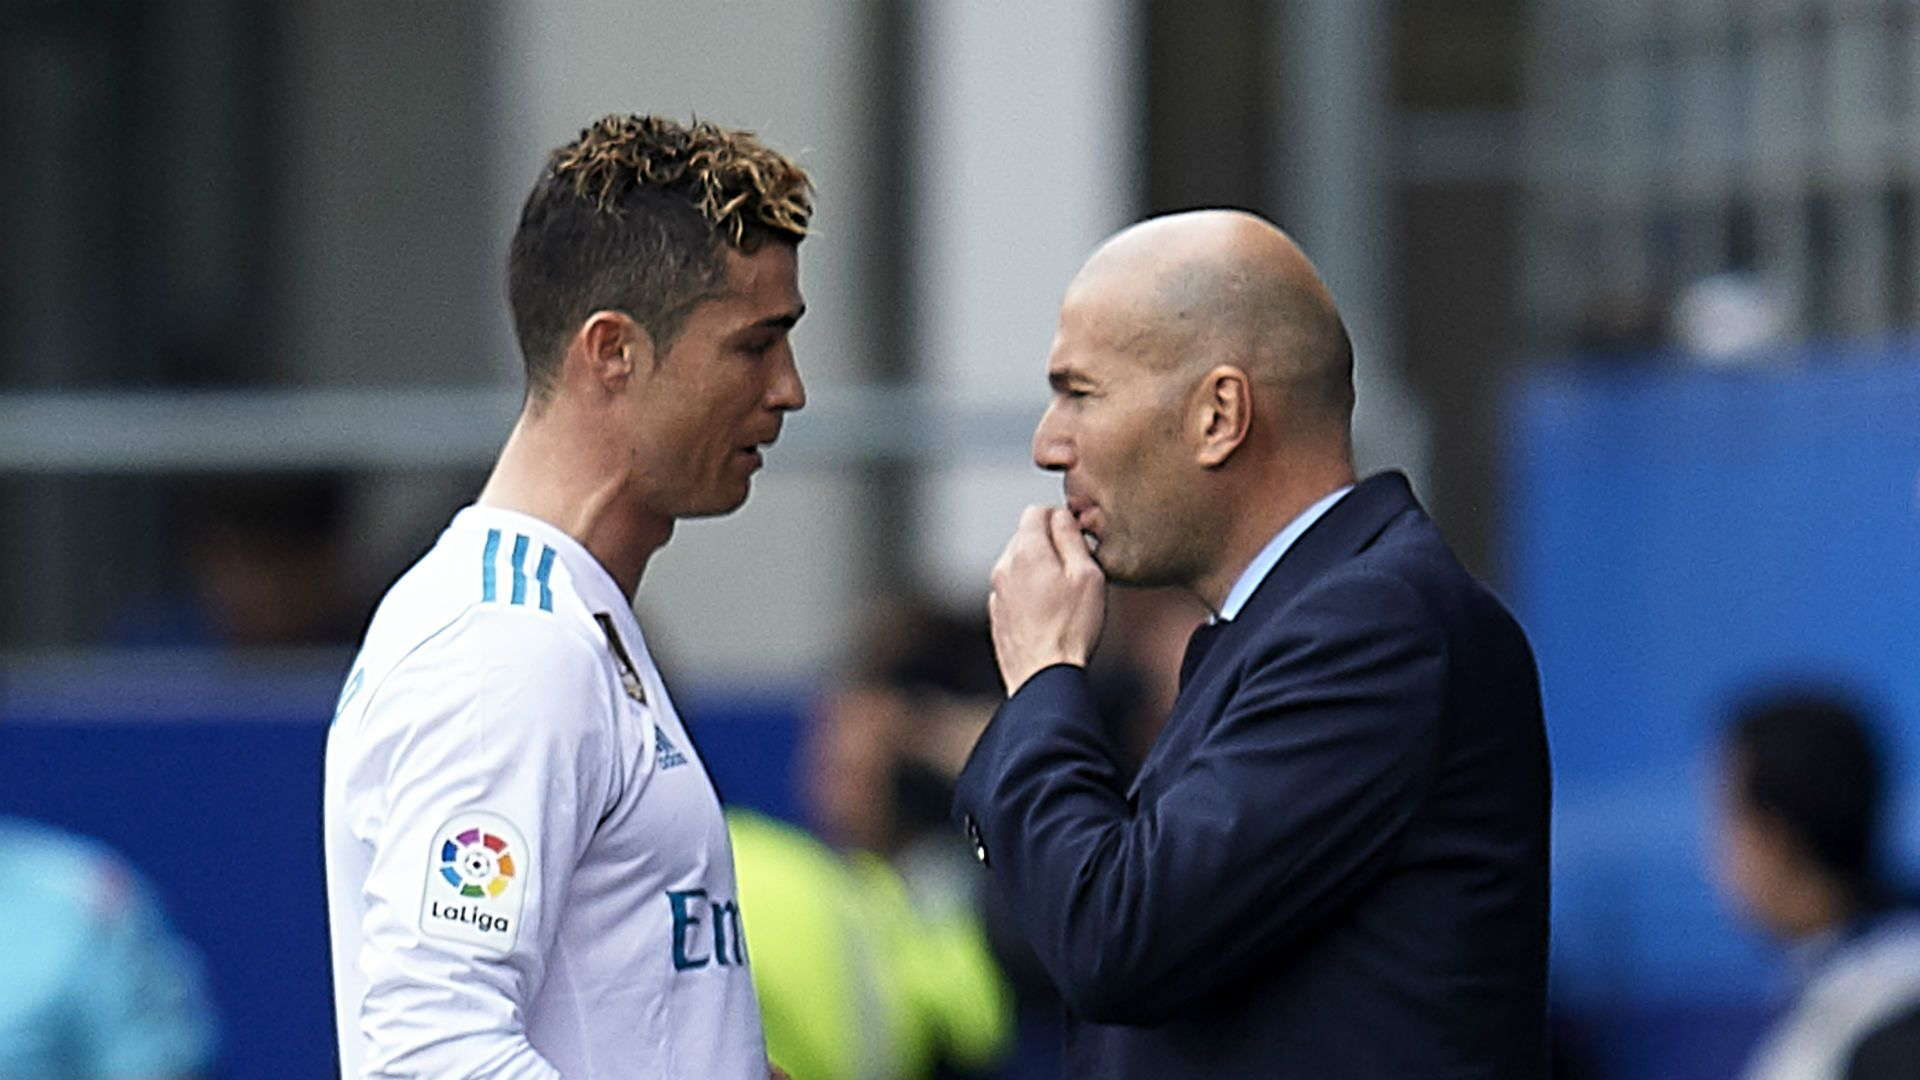 Ramon Calderon : Zidane Ingin Pertahankan Ronaldo